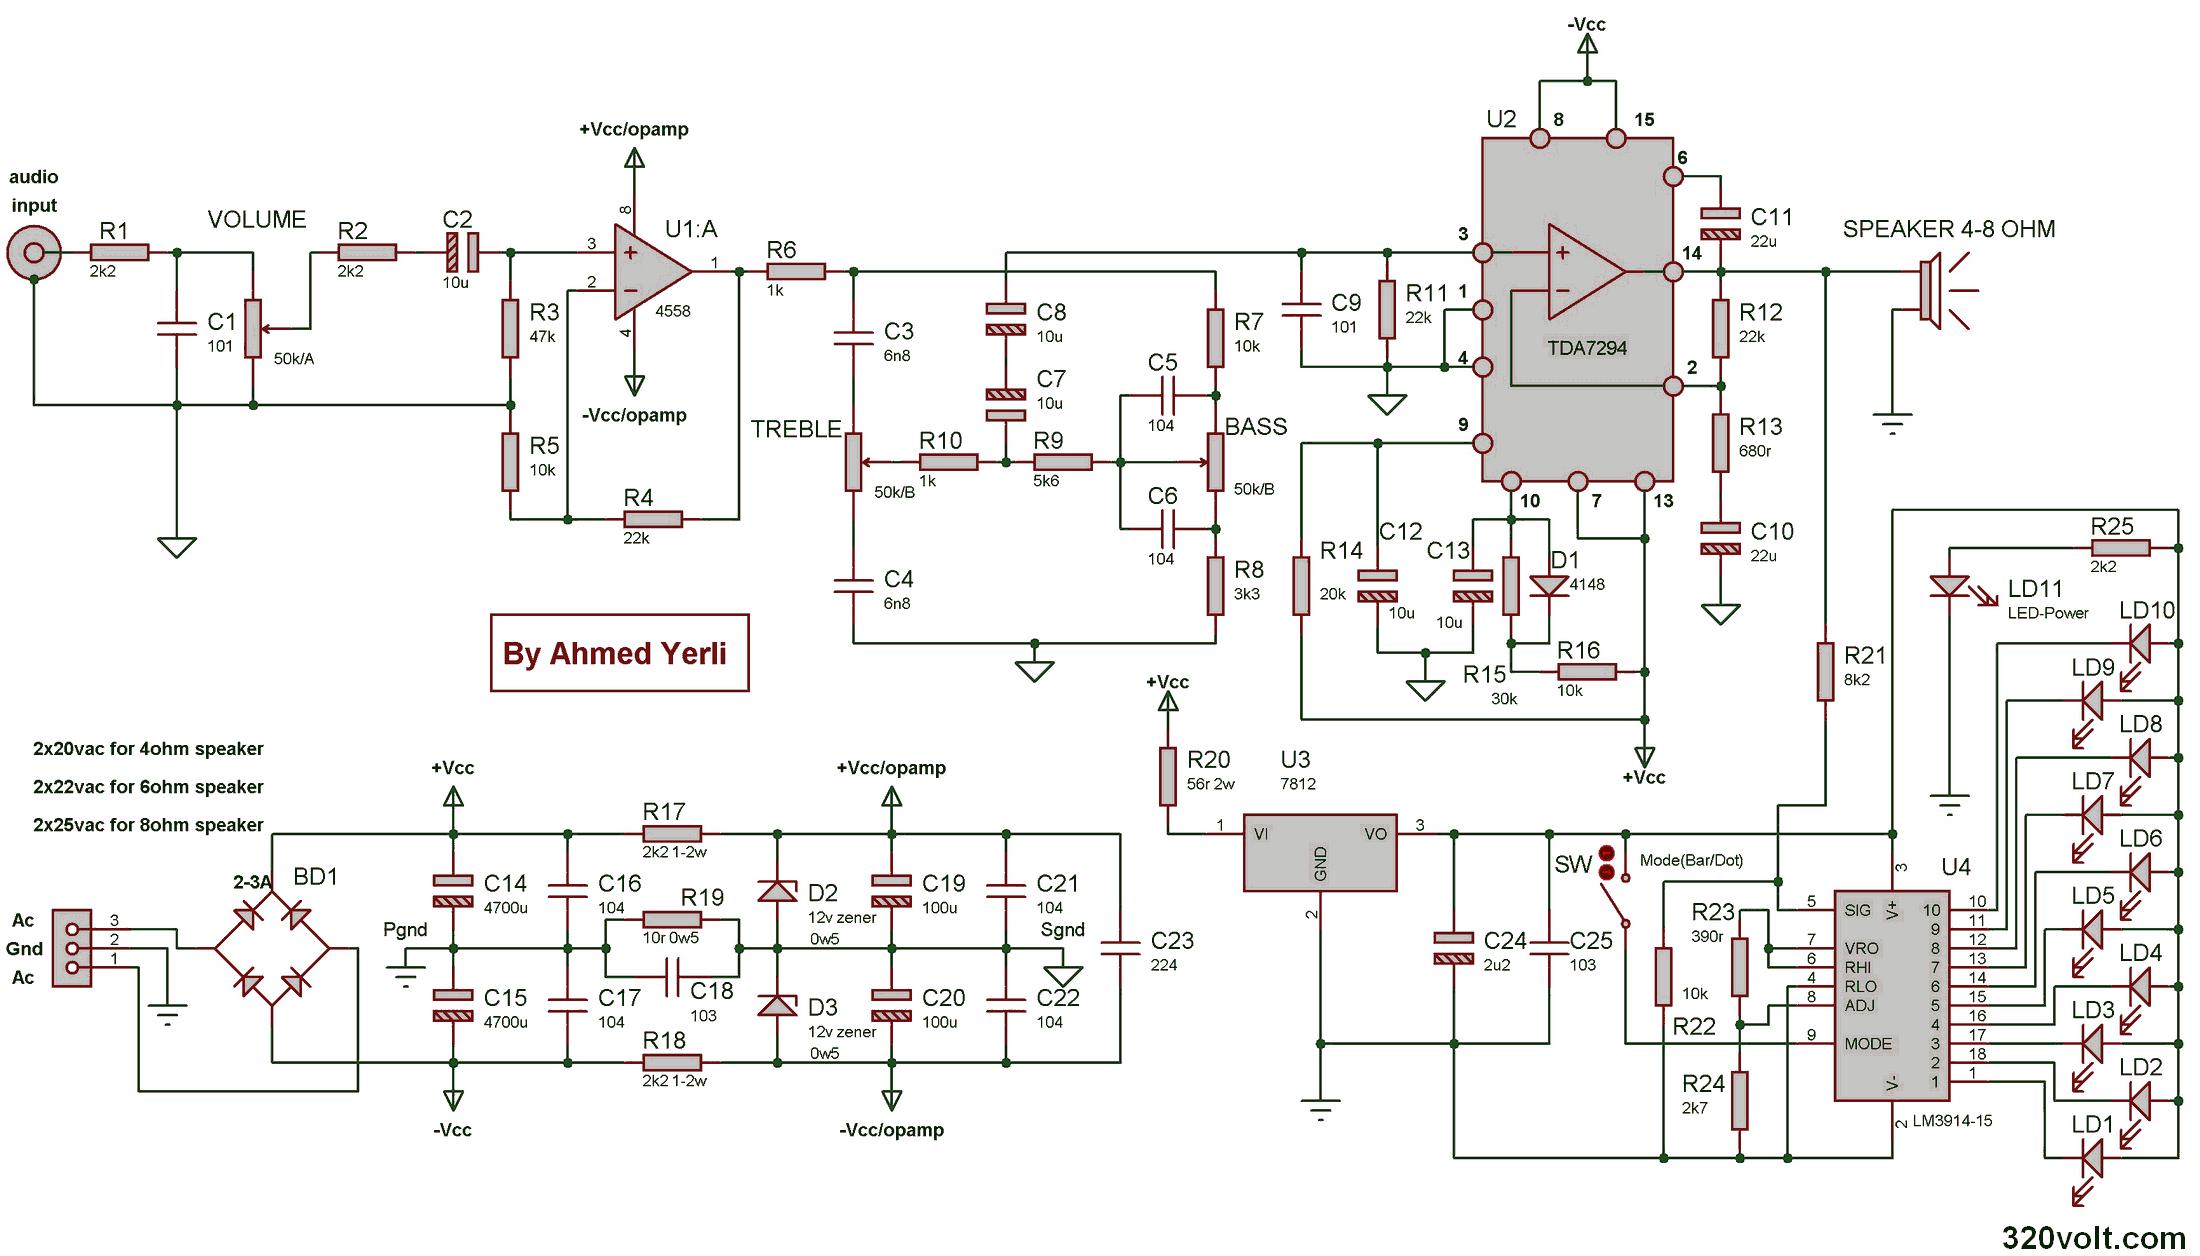 Tda7294 Complete 100w Amplifier Vu Meter Tone Control